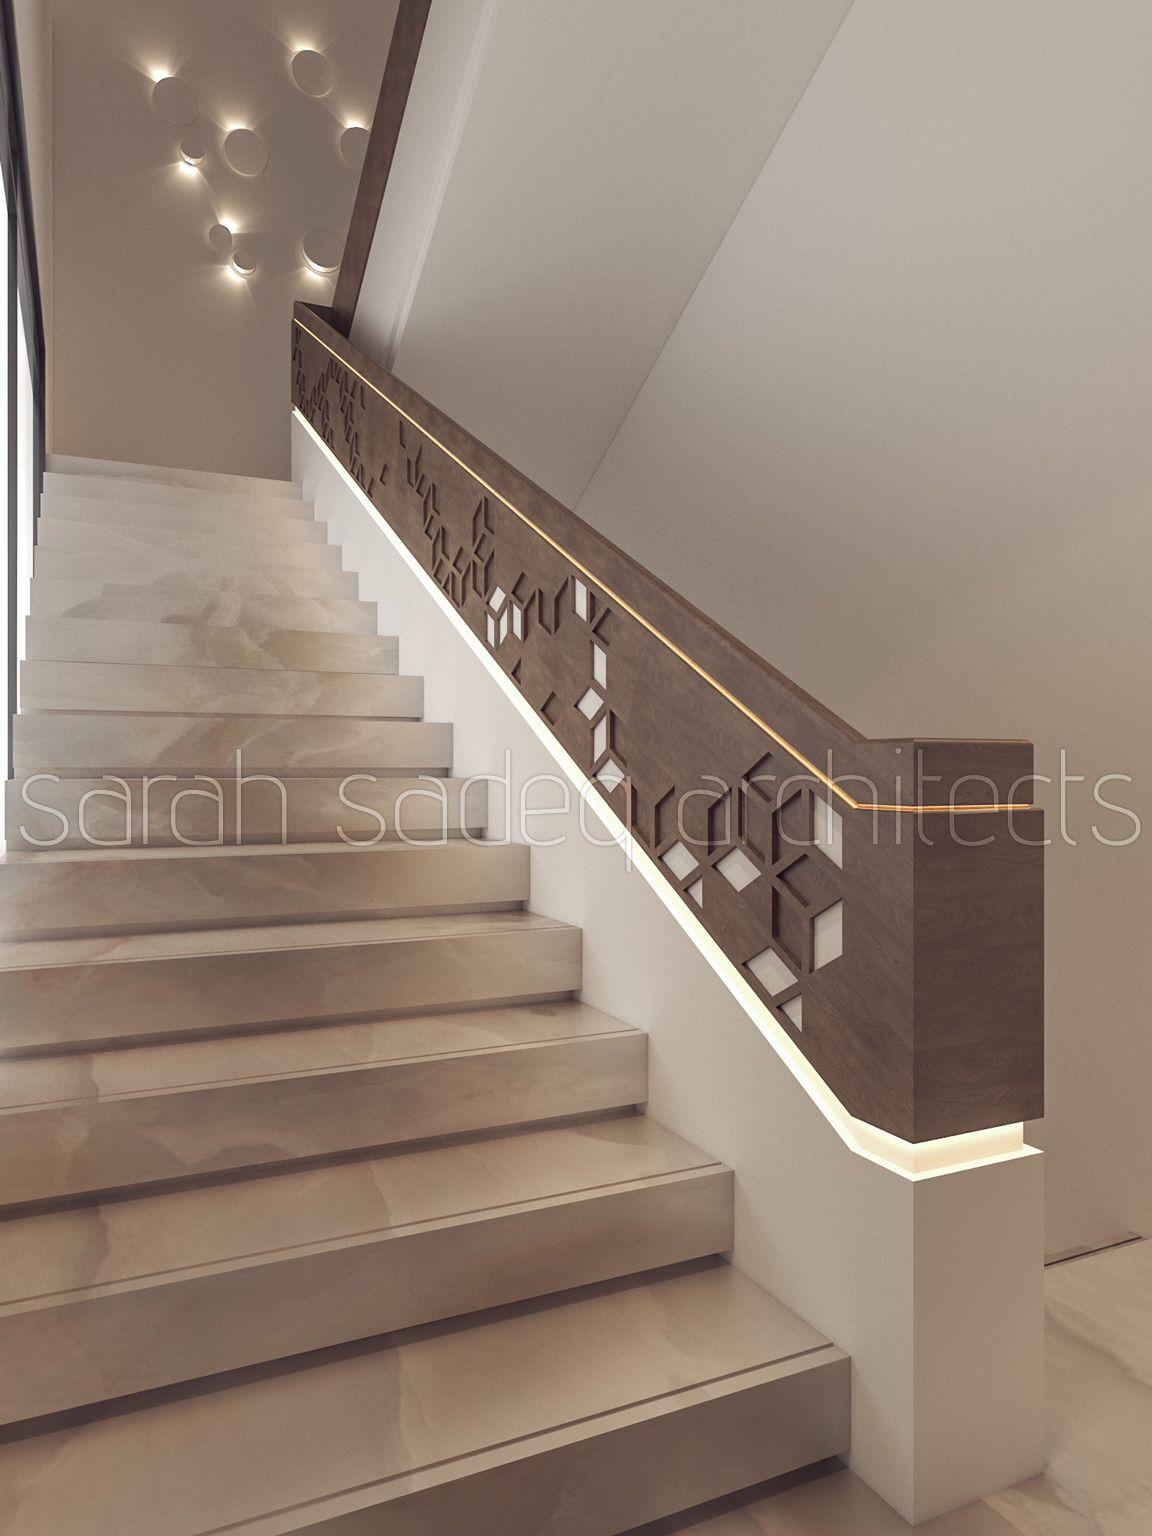 Interior sarah sadeq architects kuwait stair walls stairs staircase handrail modern also best images in hand railing rh pinterest